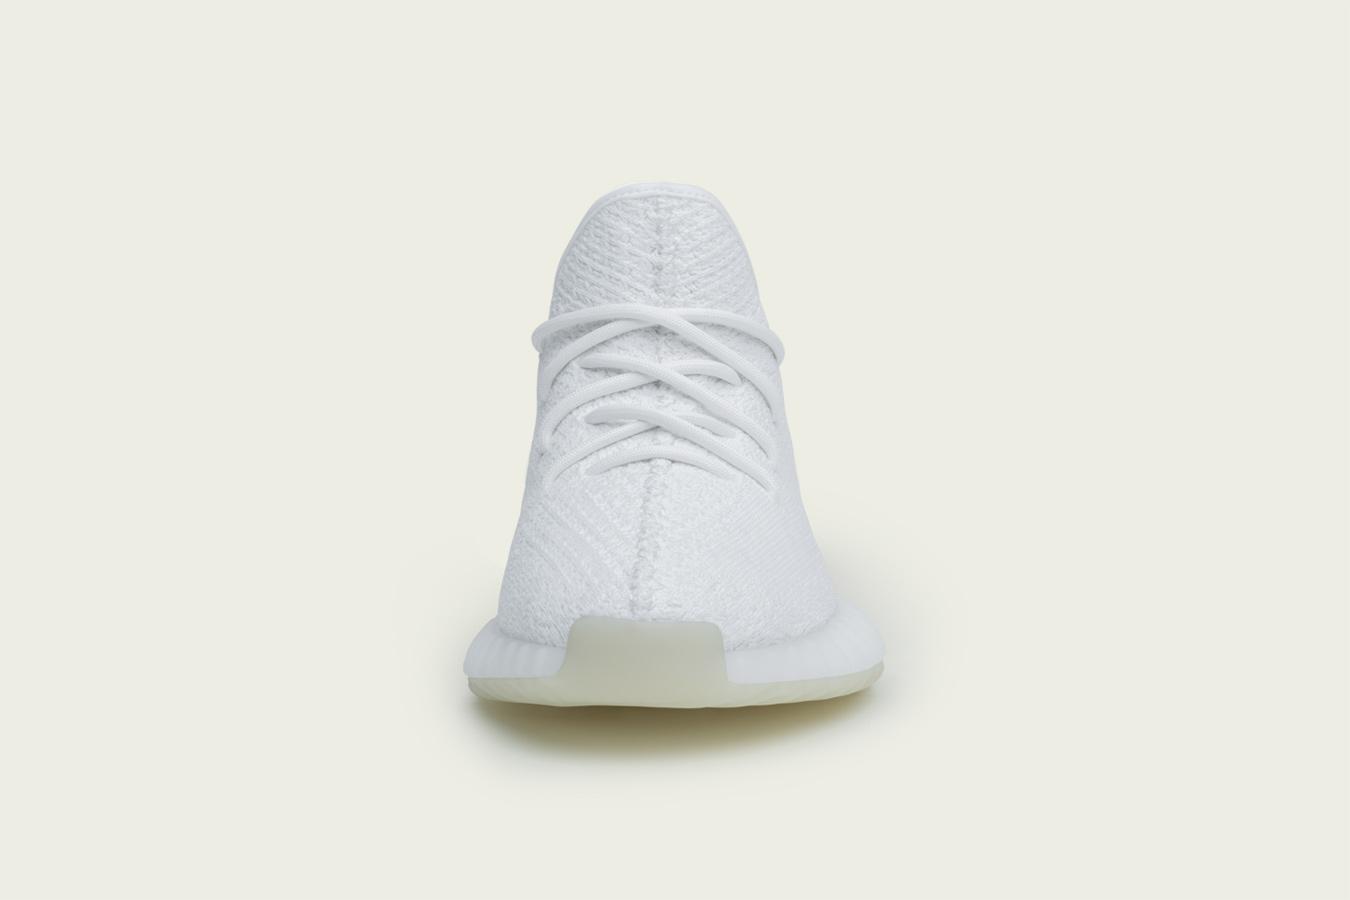 Adidas YEEZY BOOST 350 V2 – Cream White